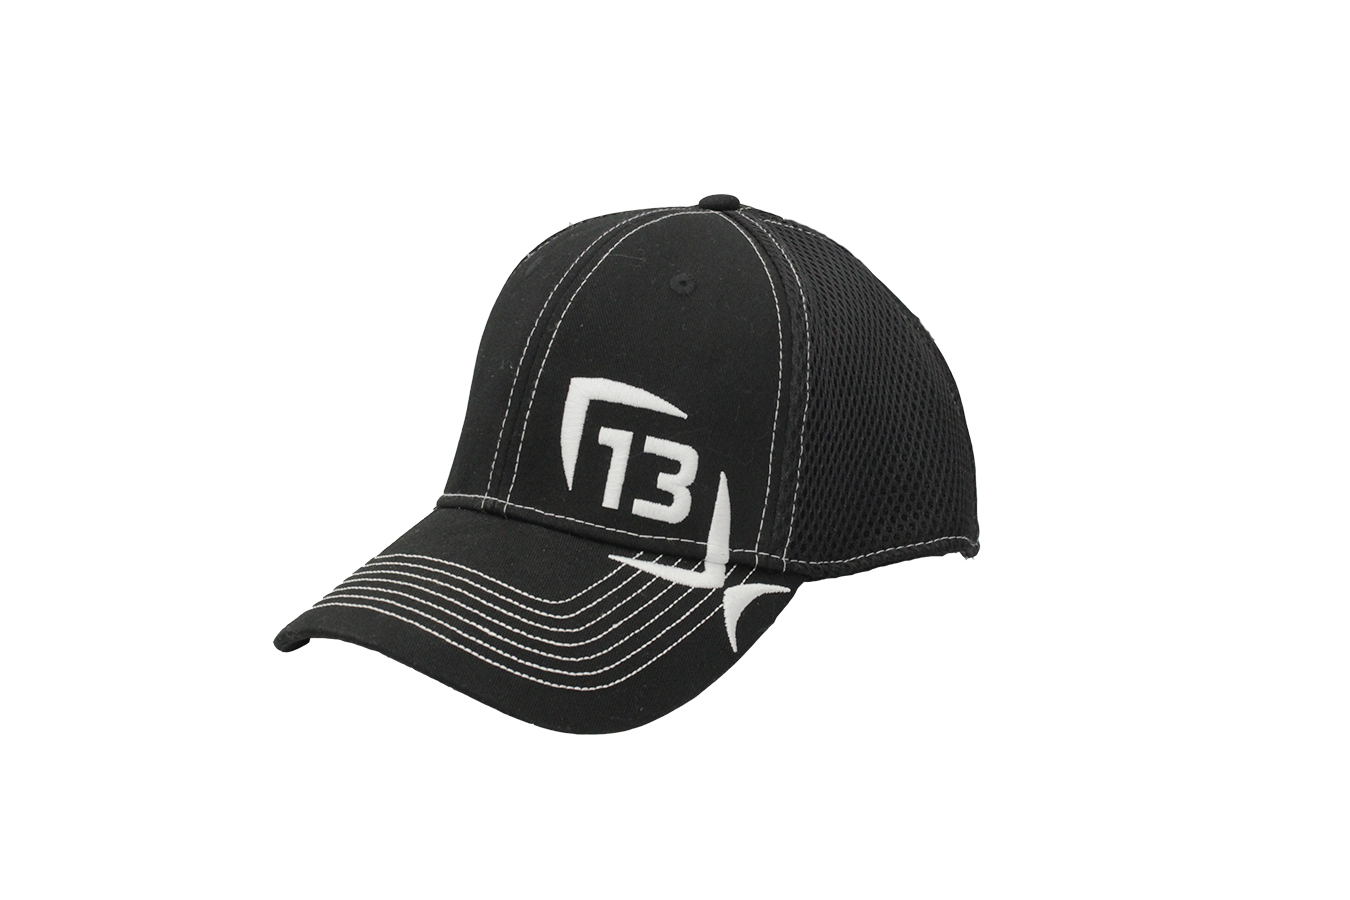 32fcc1f1a63 13 Fishing The Professional Black Flex Fit Hat